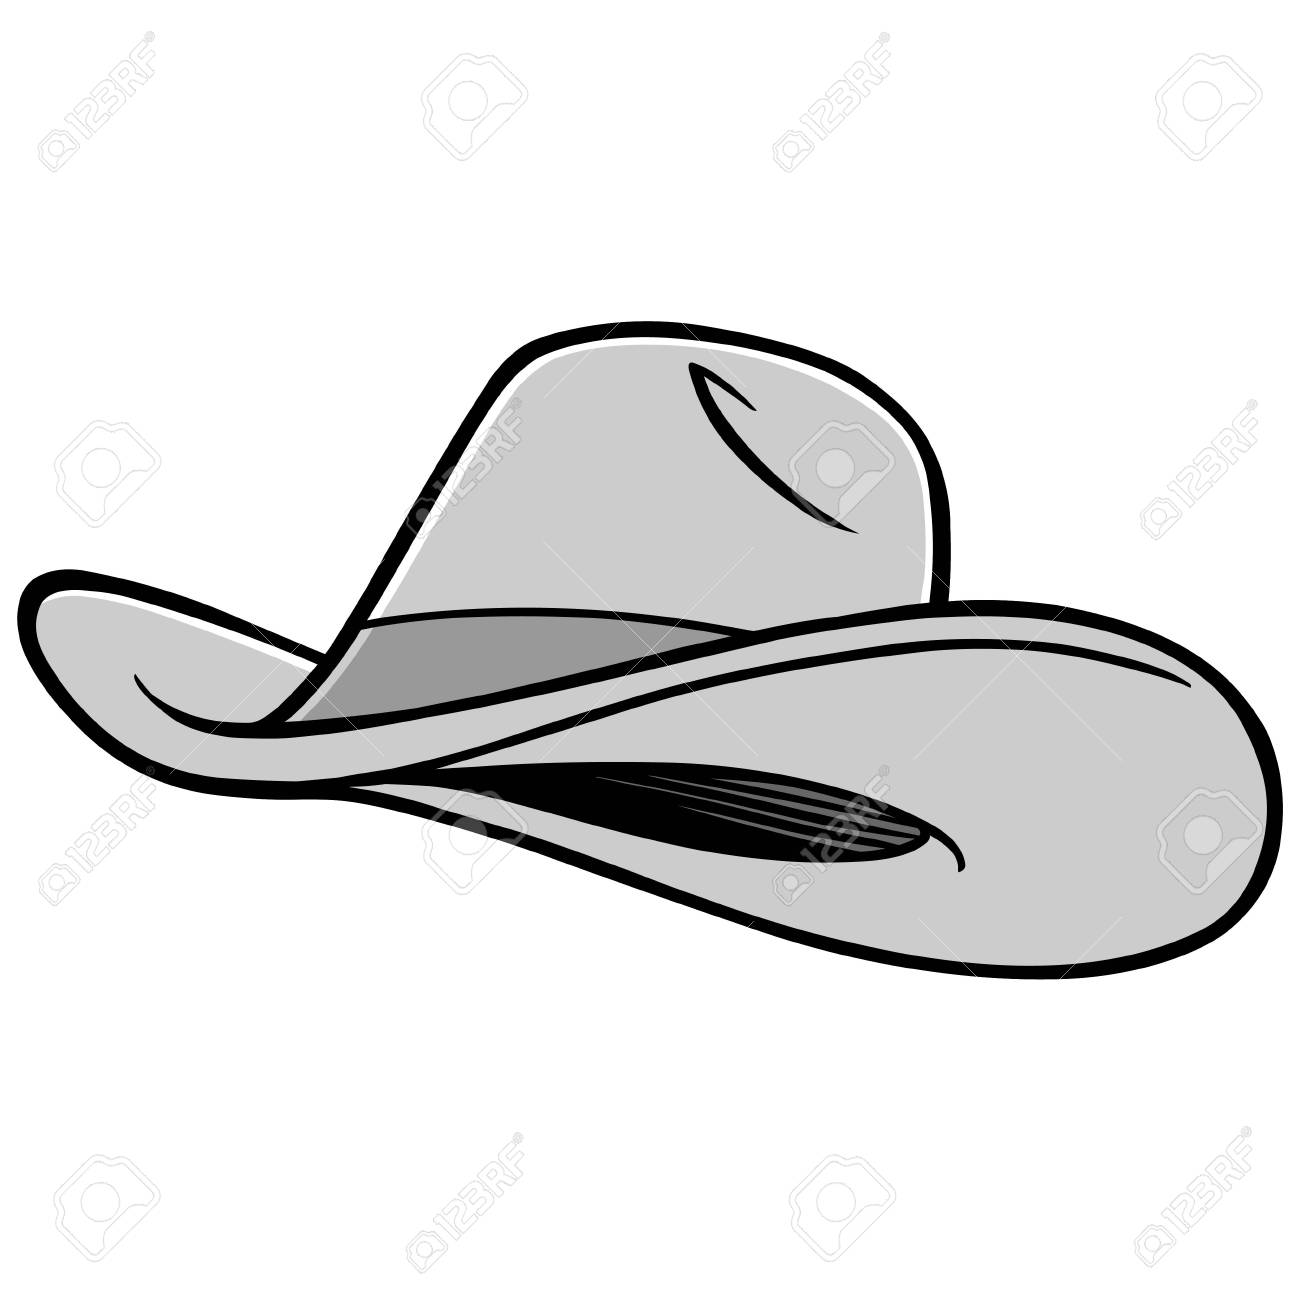 hight resolution of cowboy hat illustration stock vector 71439796